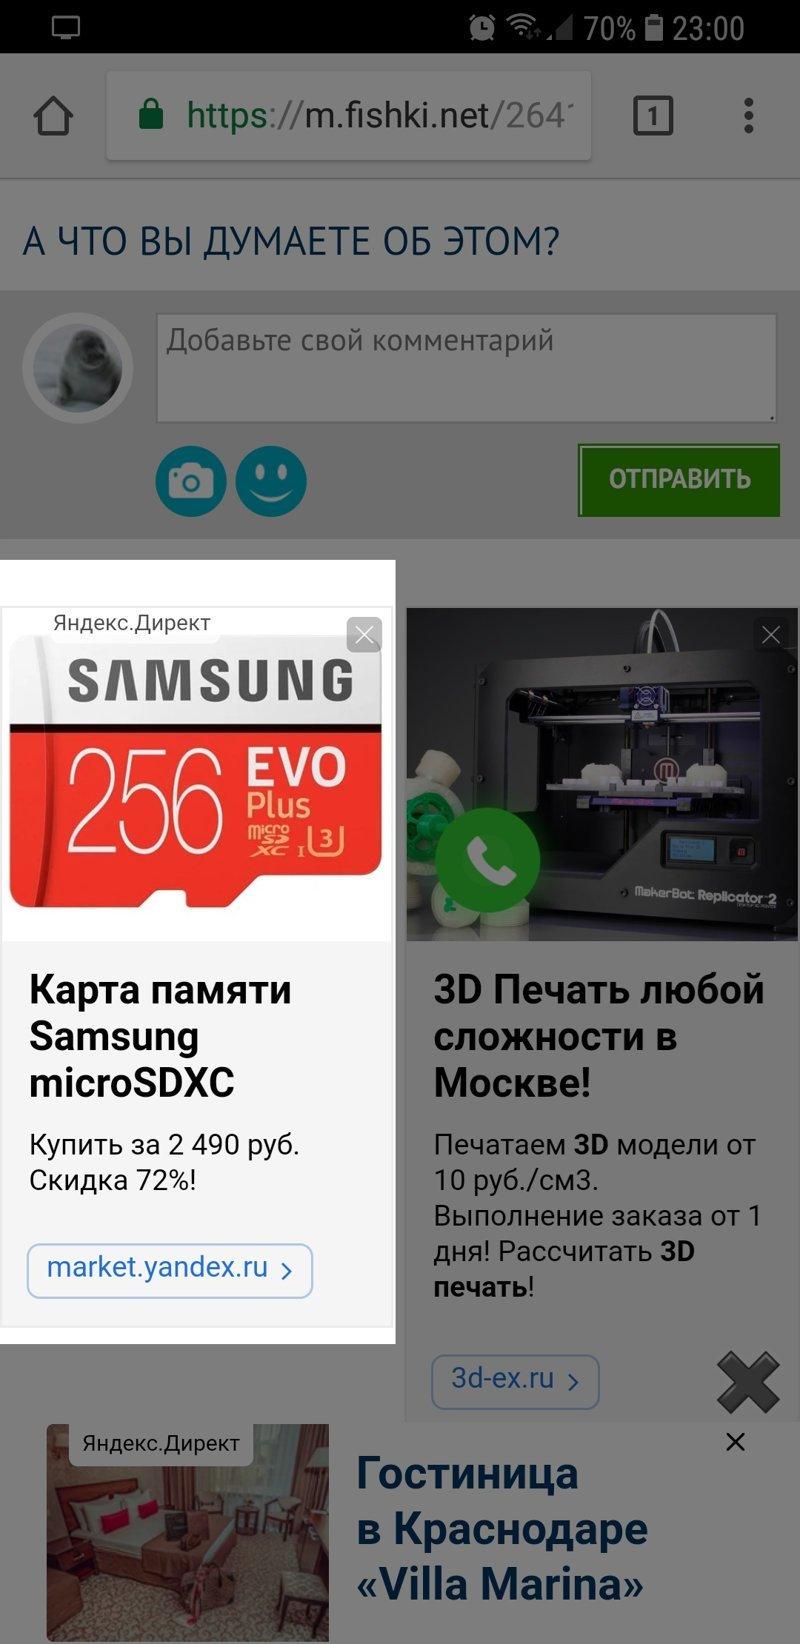 Samsung EVO Plus XC 1 (3) на 256 ГБ за 2490 руб! Со скидкой 72%! yandex, закон о рекламе, защита прав потребителей, контекстная реклама, обман, развод, яндекс